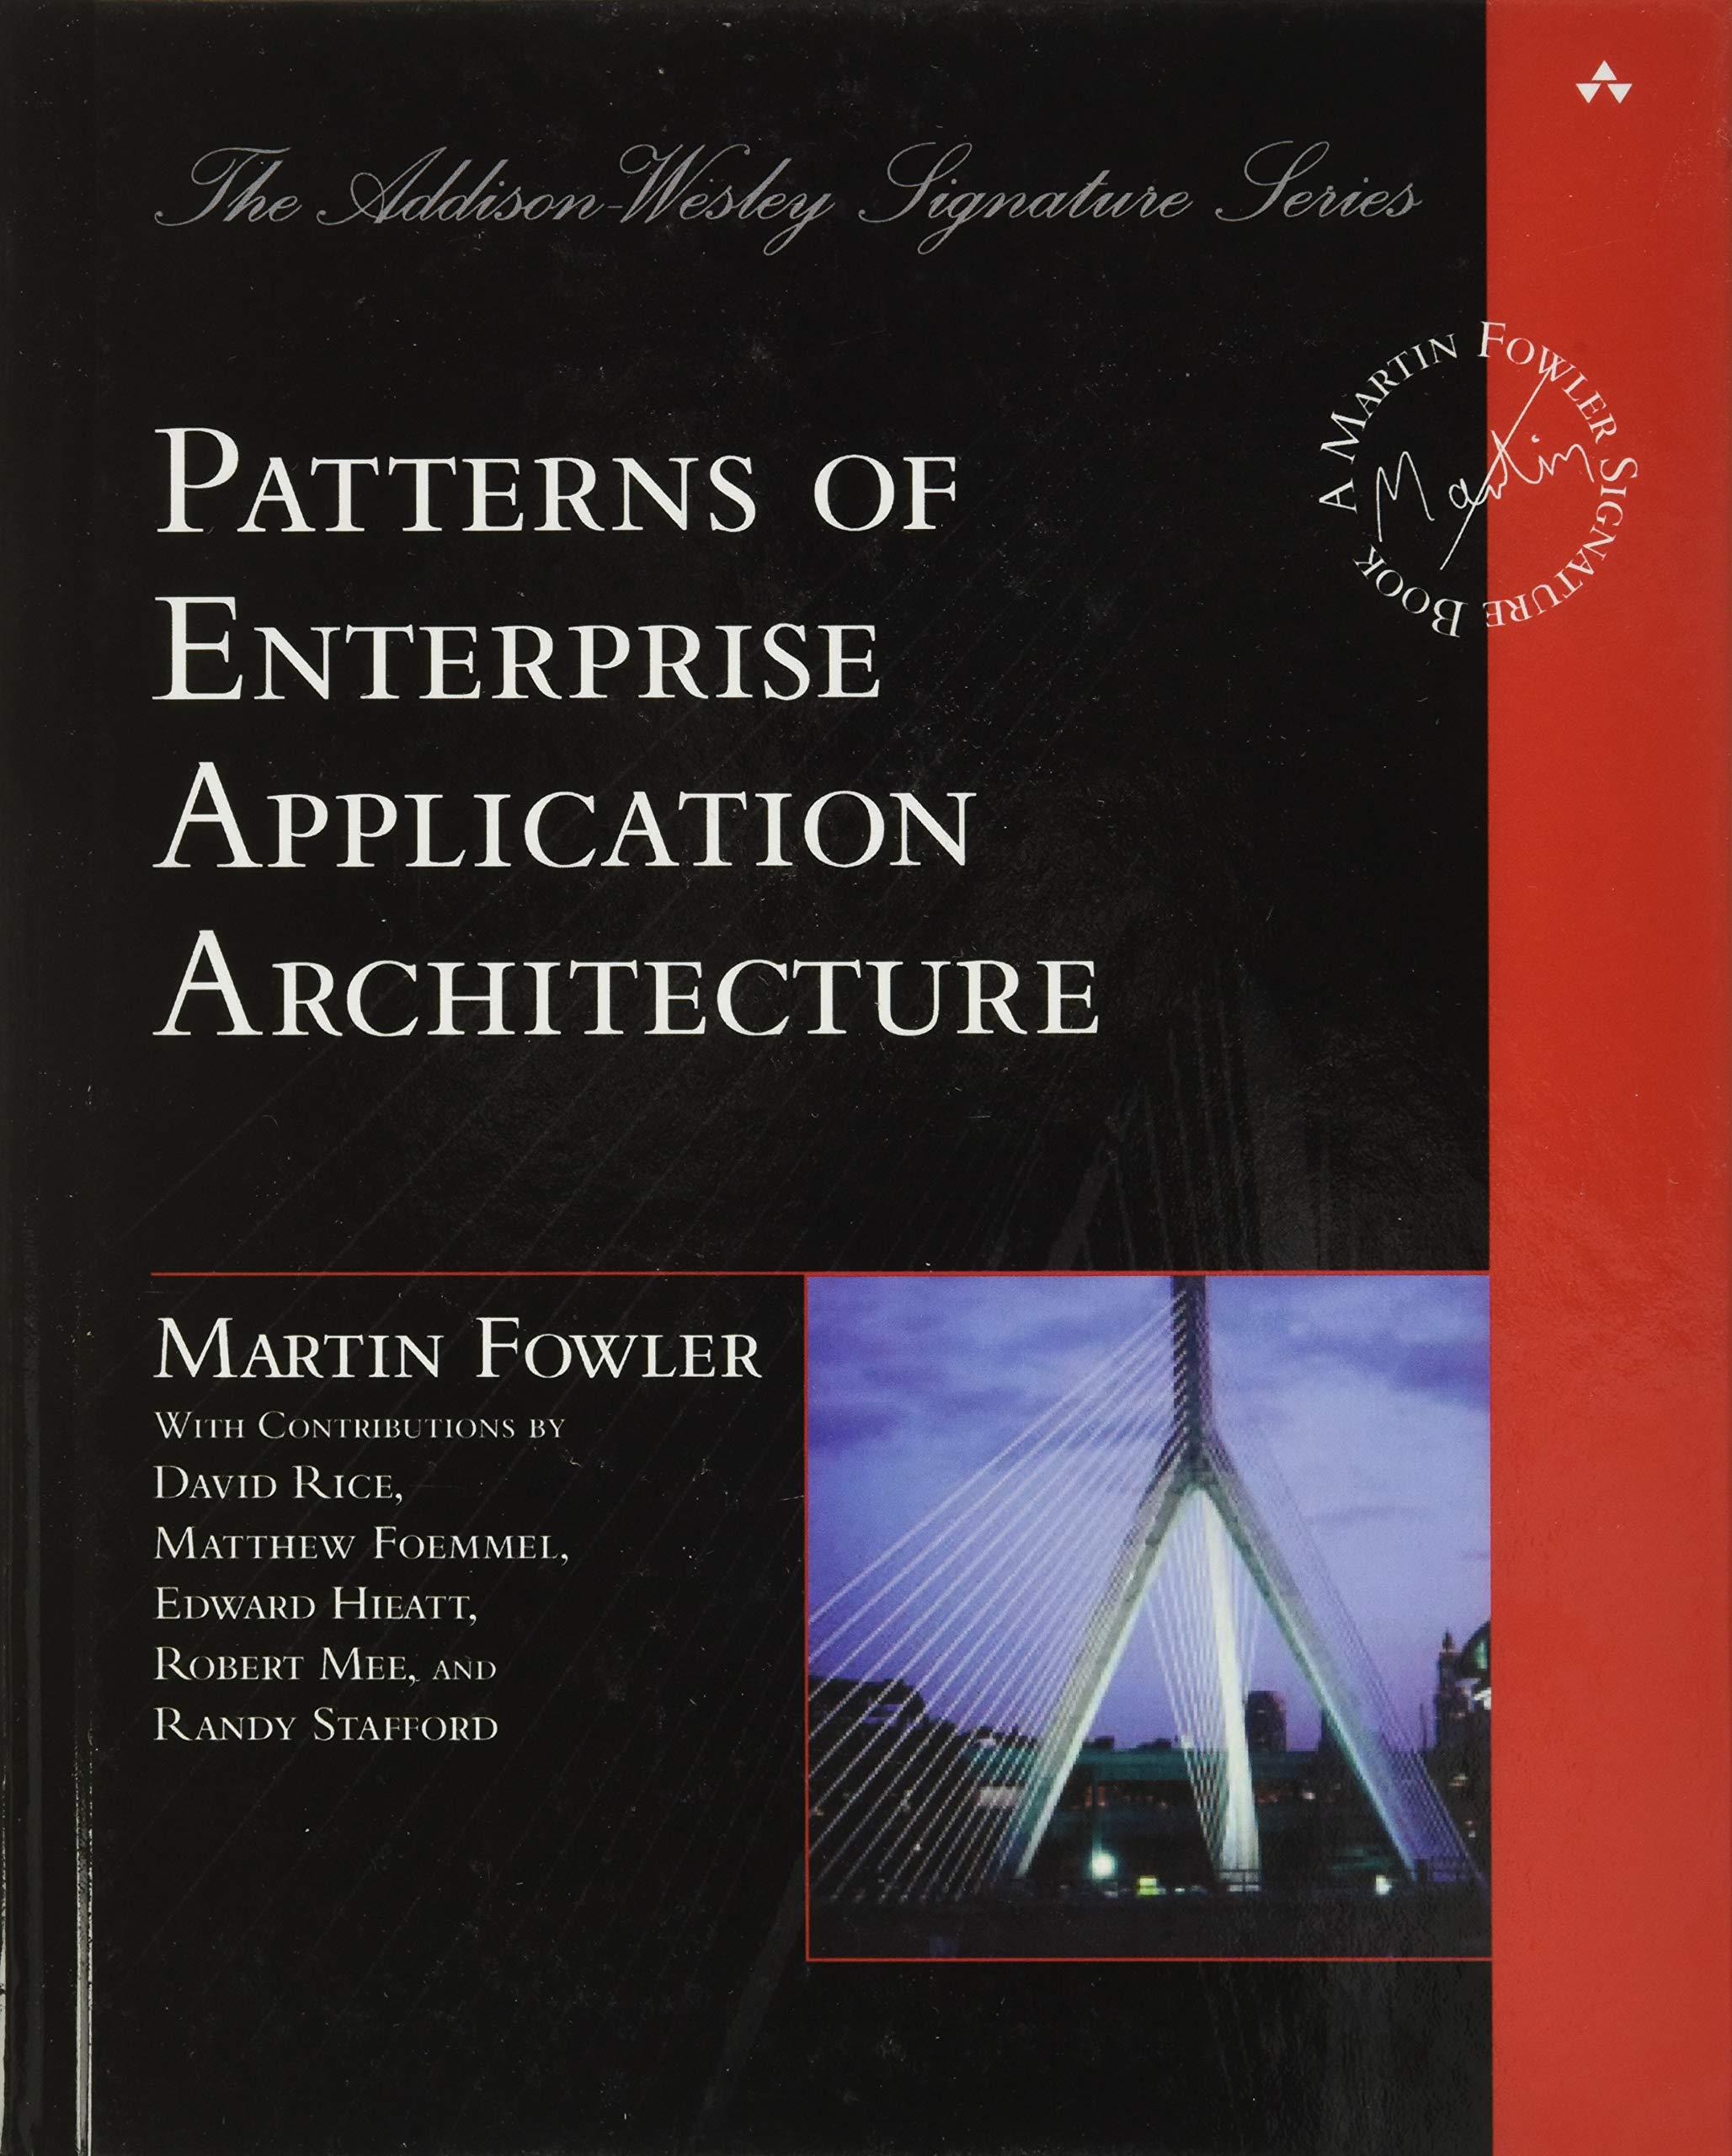 Patterns of Enterprise Application Architecture book